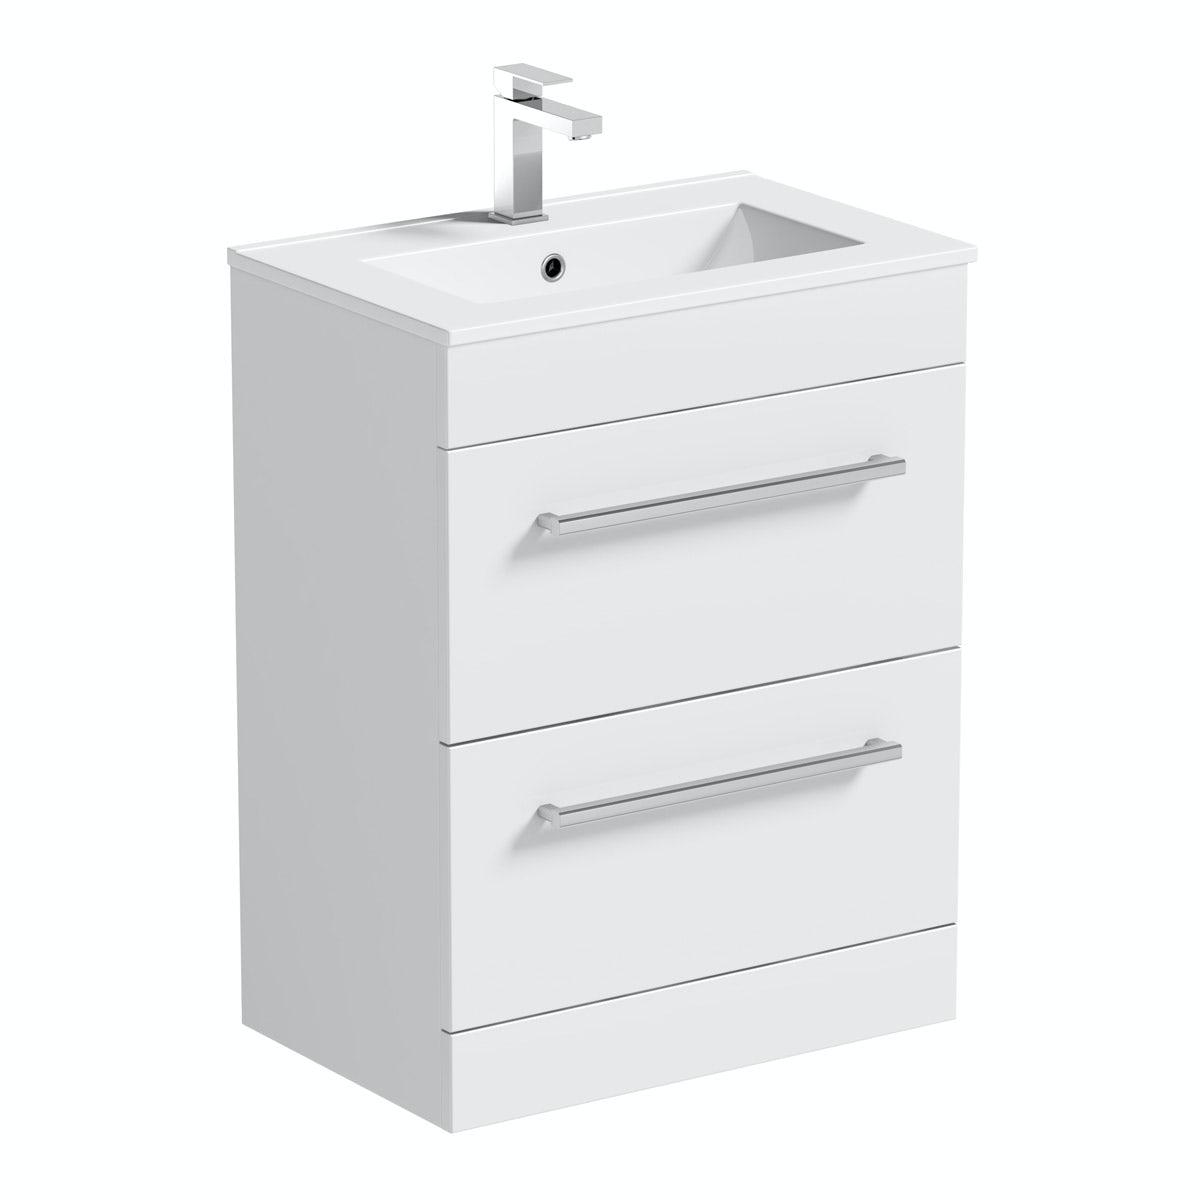 Orchard Derwent white vanity drawer unit and basin 600mm